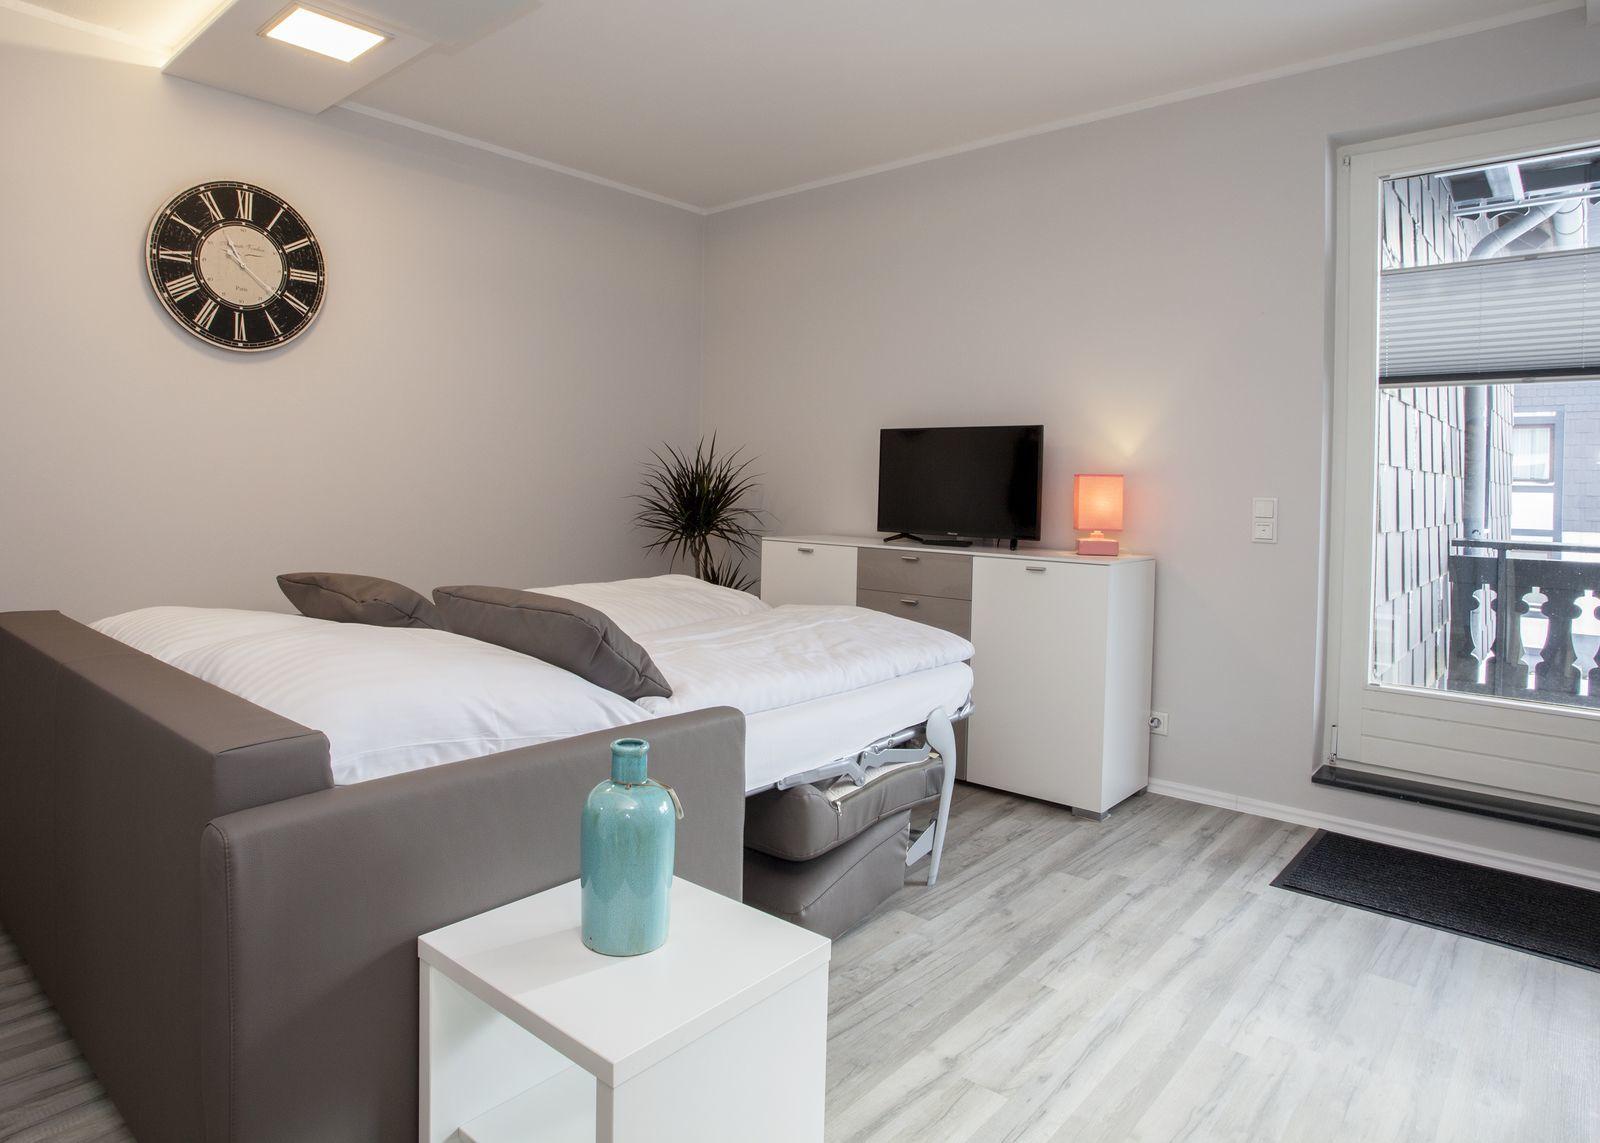 Apartment - Comfort 4 Persons